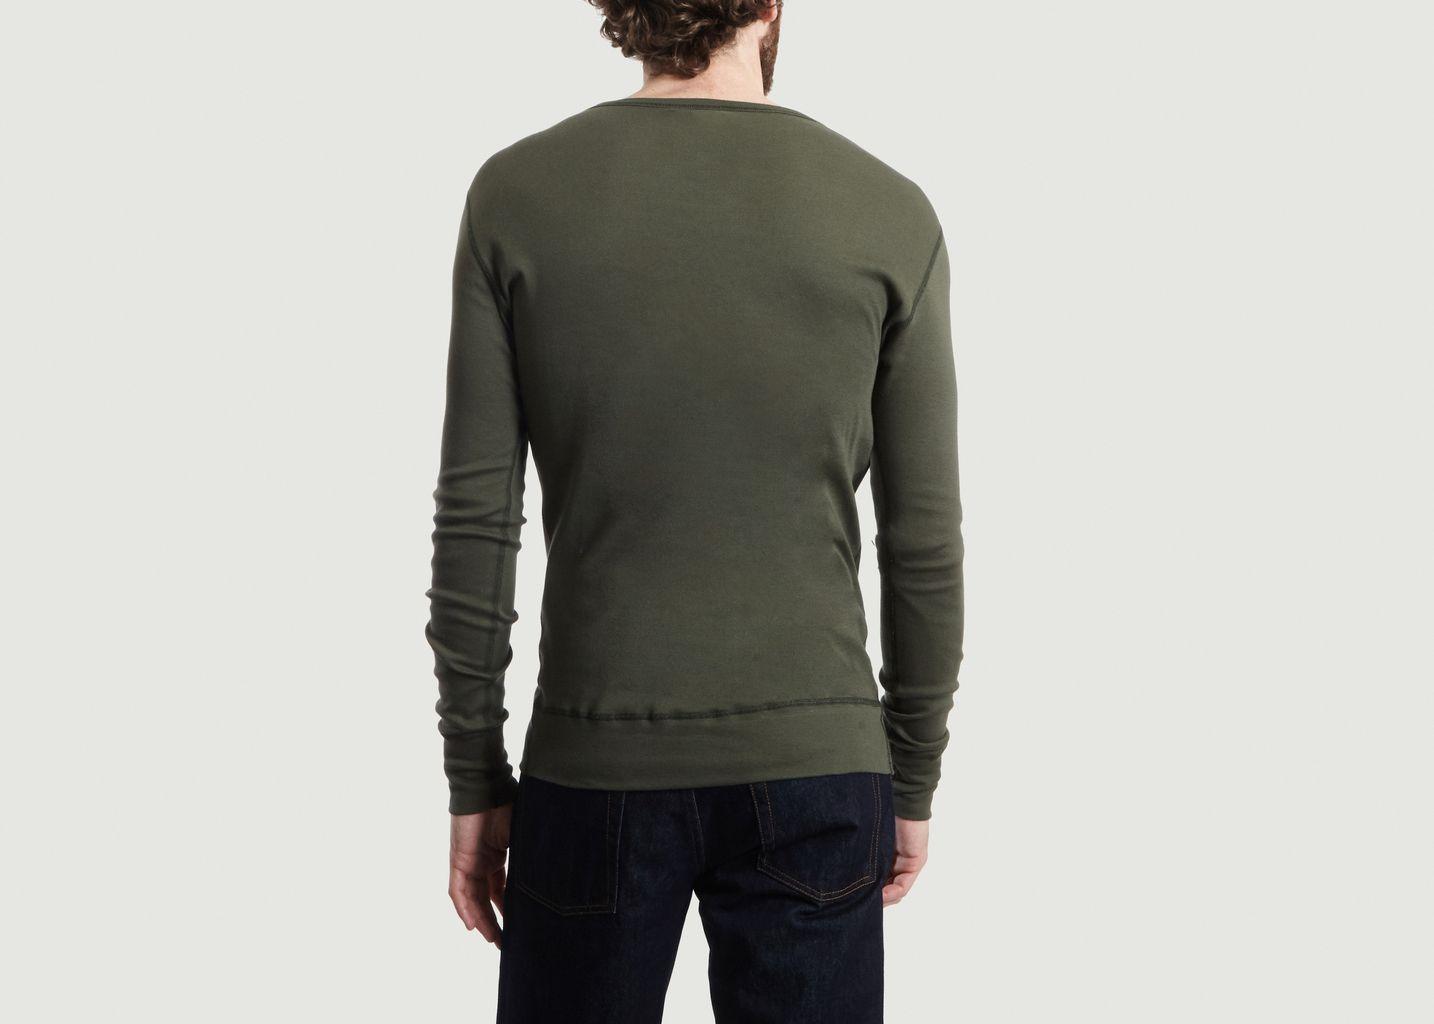 T-Shirt Henley Harri - Hemen